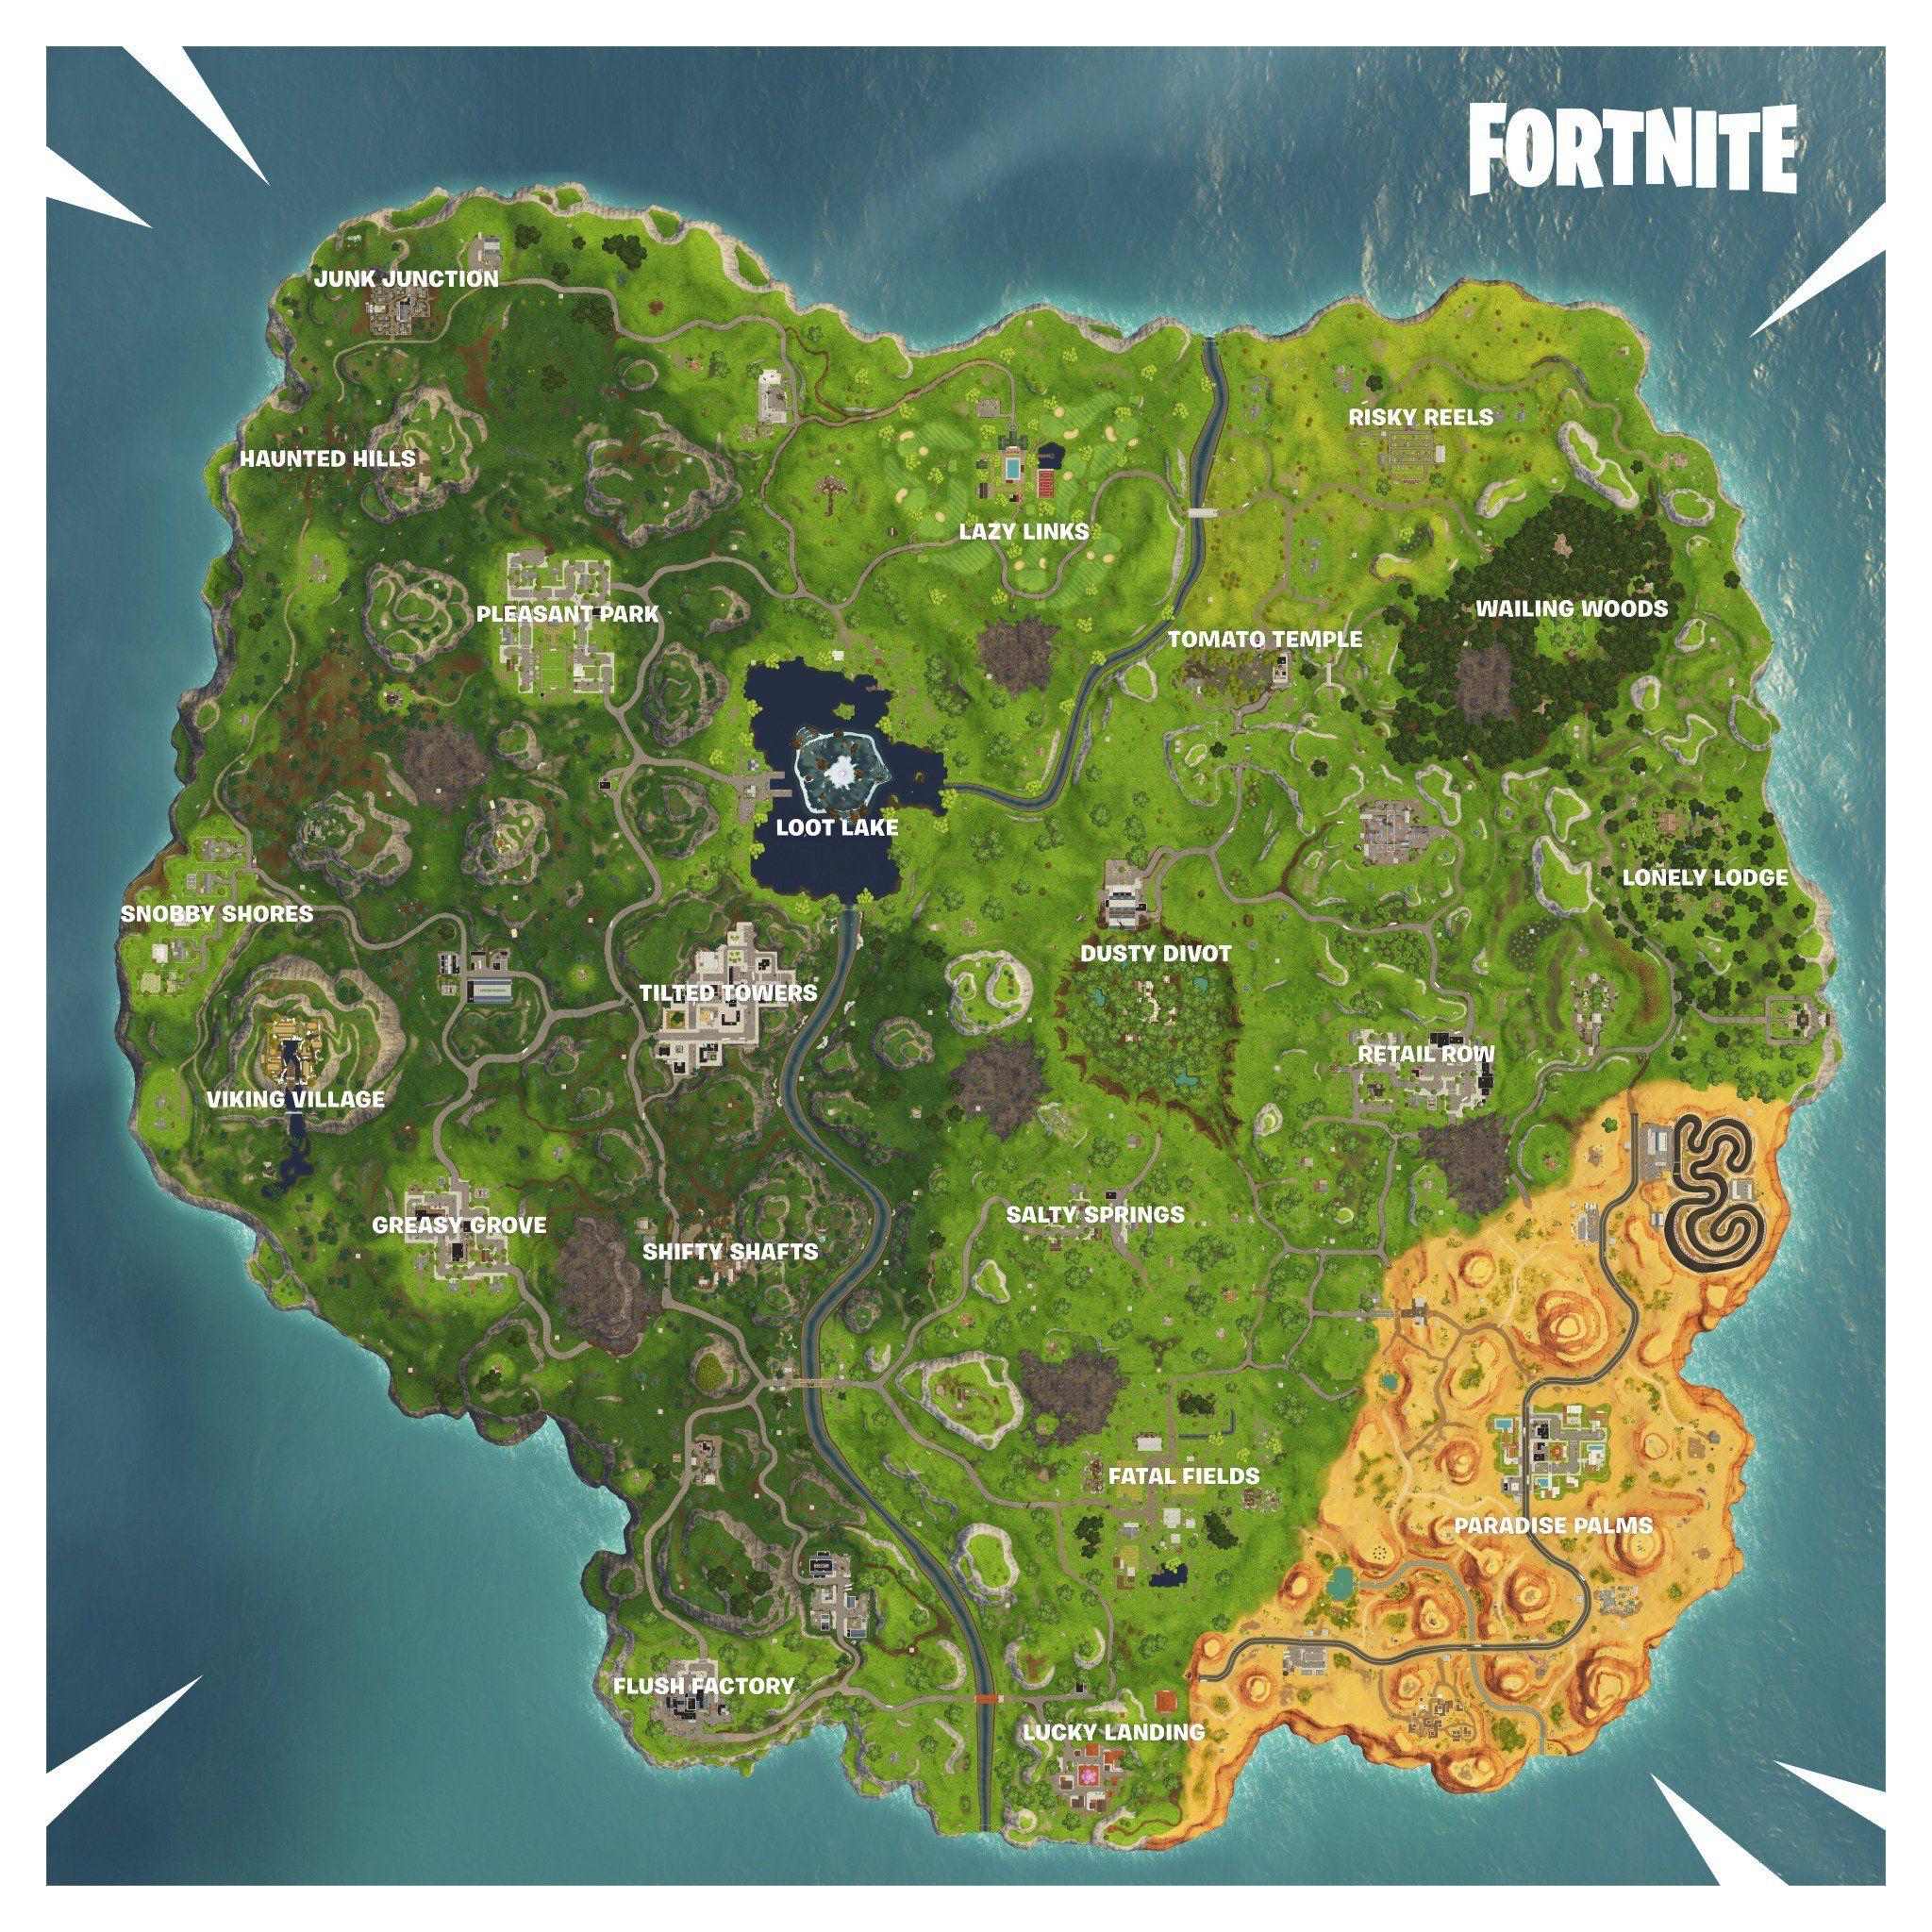 New Fortnite Season 6 Map With Images Fortnite Map Seasons